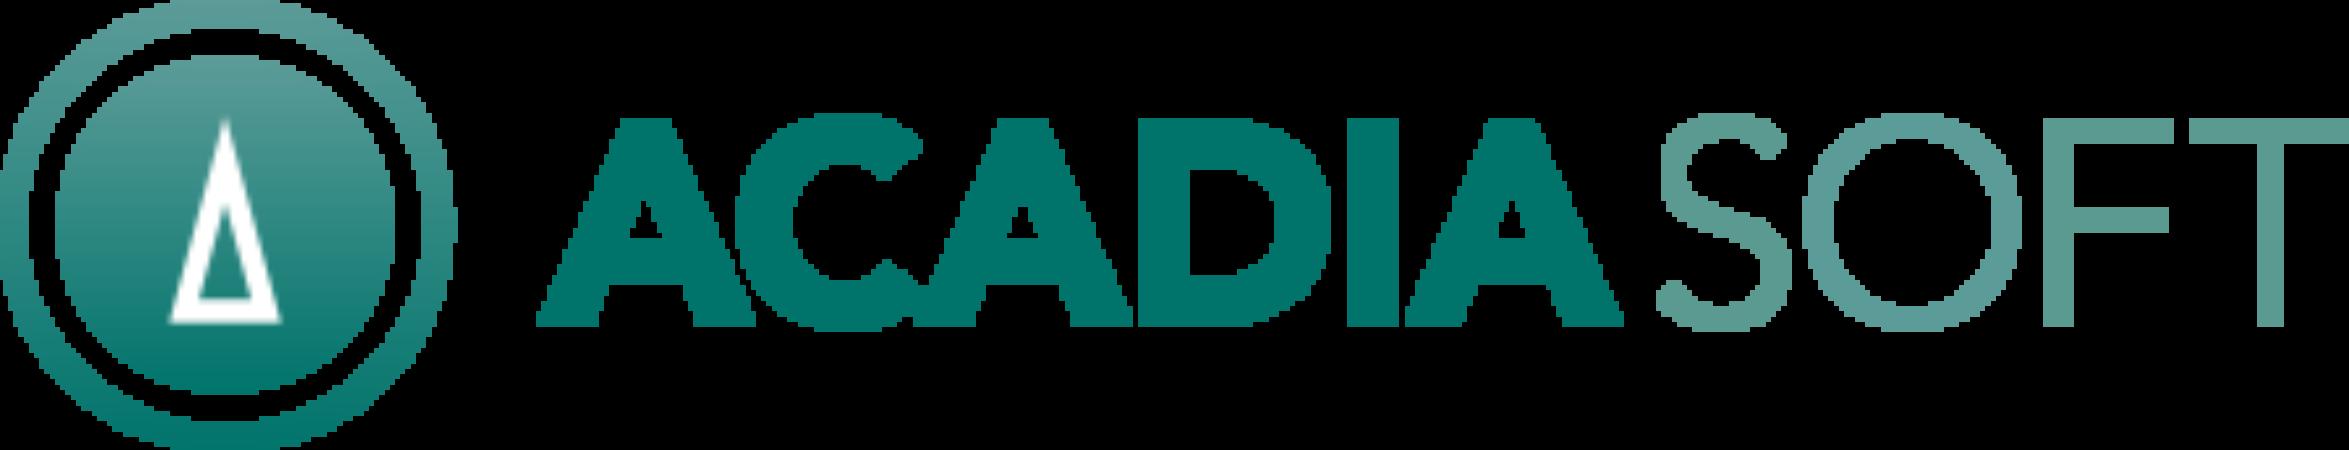 Leading Global Banks Cut Counterparty Risk as AcadiaSoft and Quantile Pilot Risk Optimisation Service